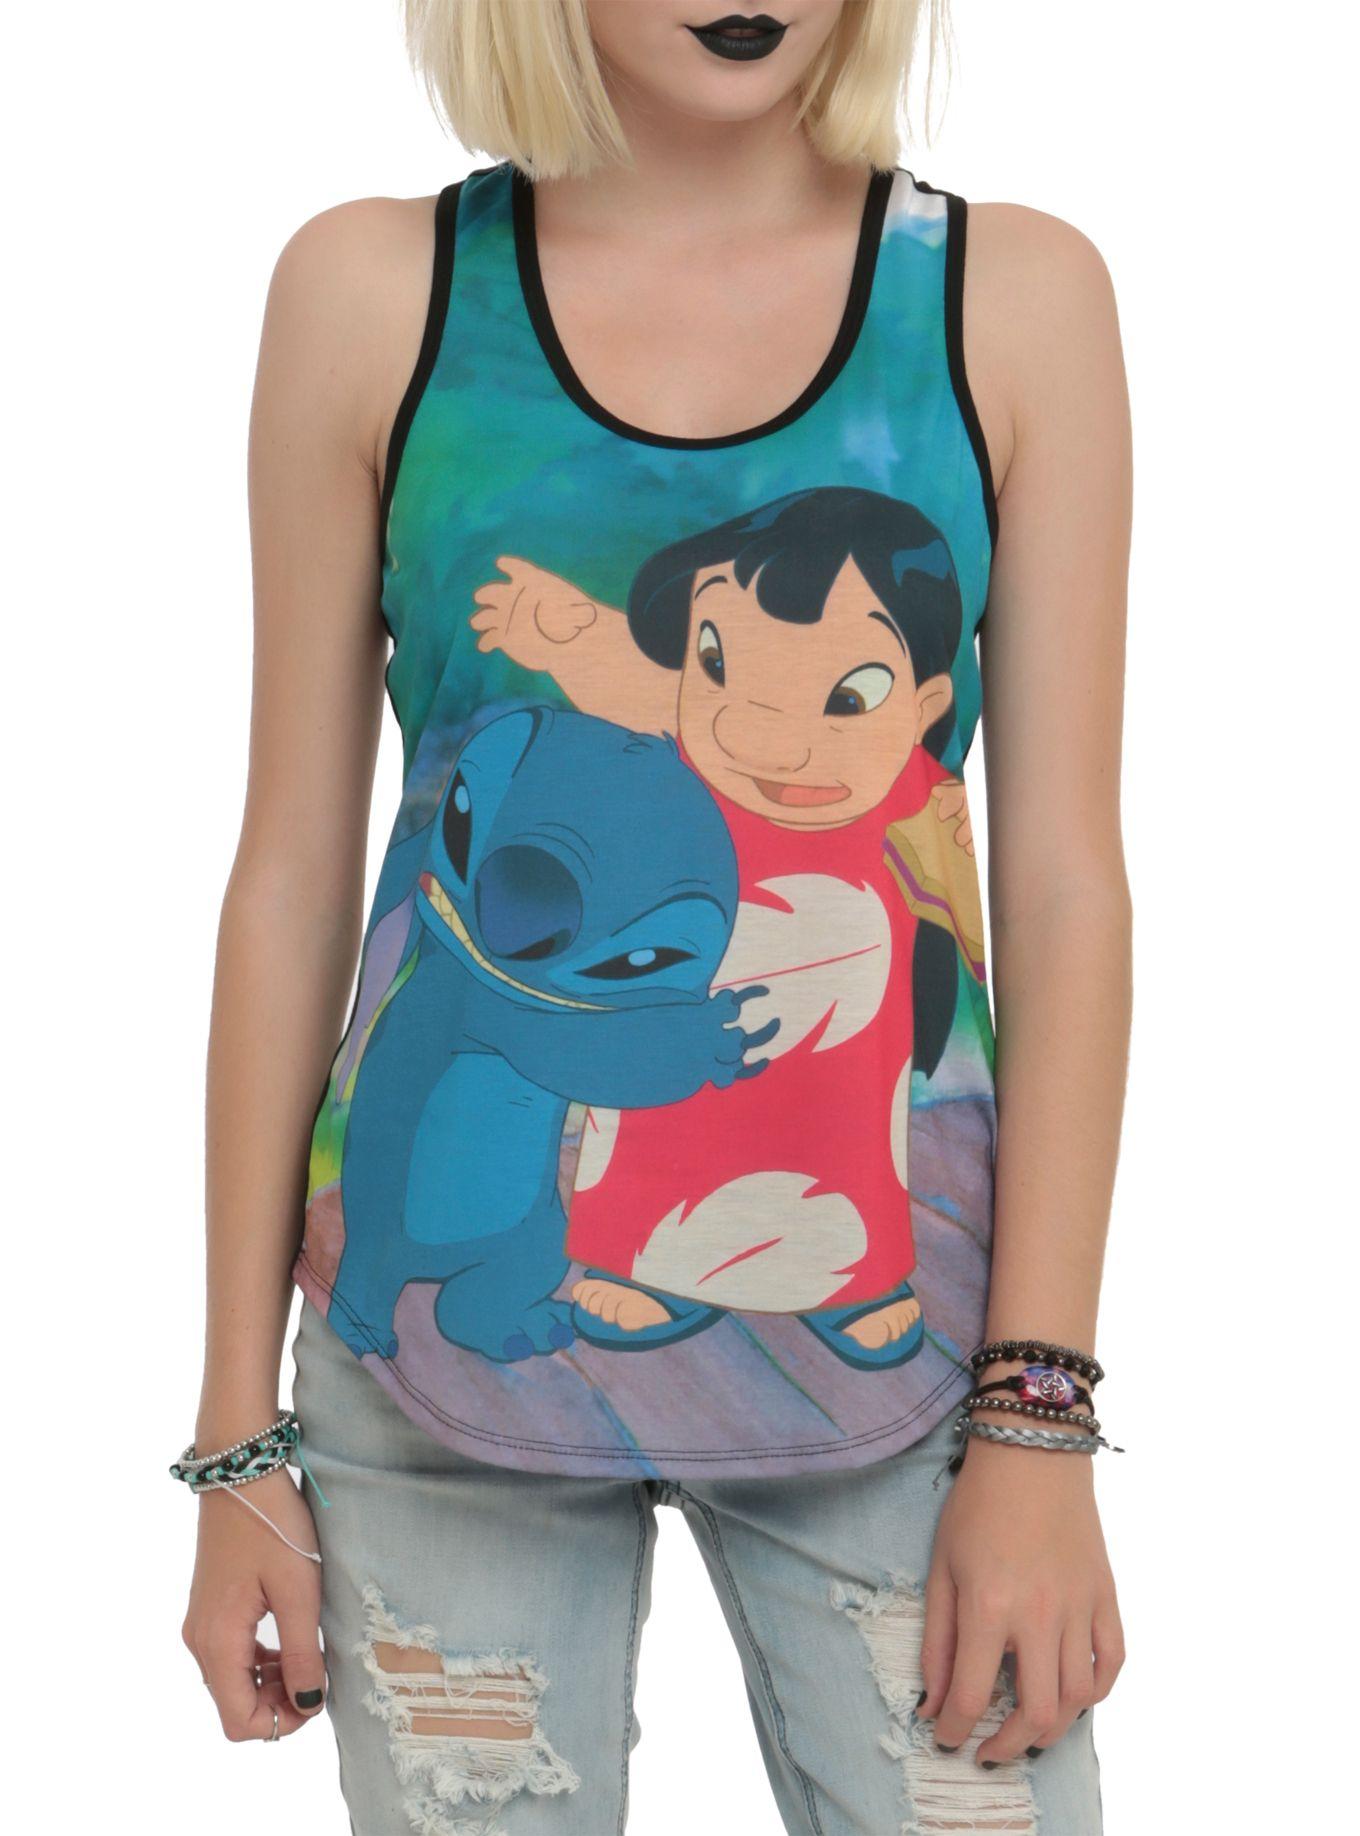 d3fd1db100e378 Disney lilo stitch duo sublimation girls tank top hot topic jpg 1360x1836  Lilo and stitch tank